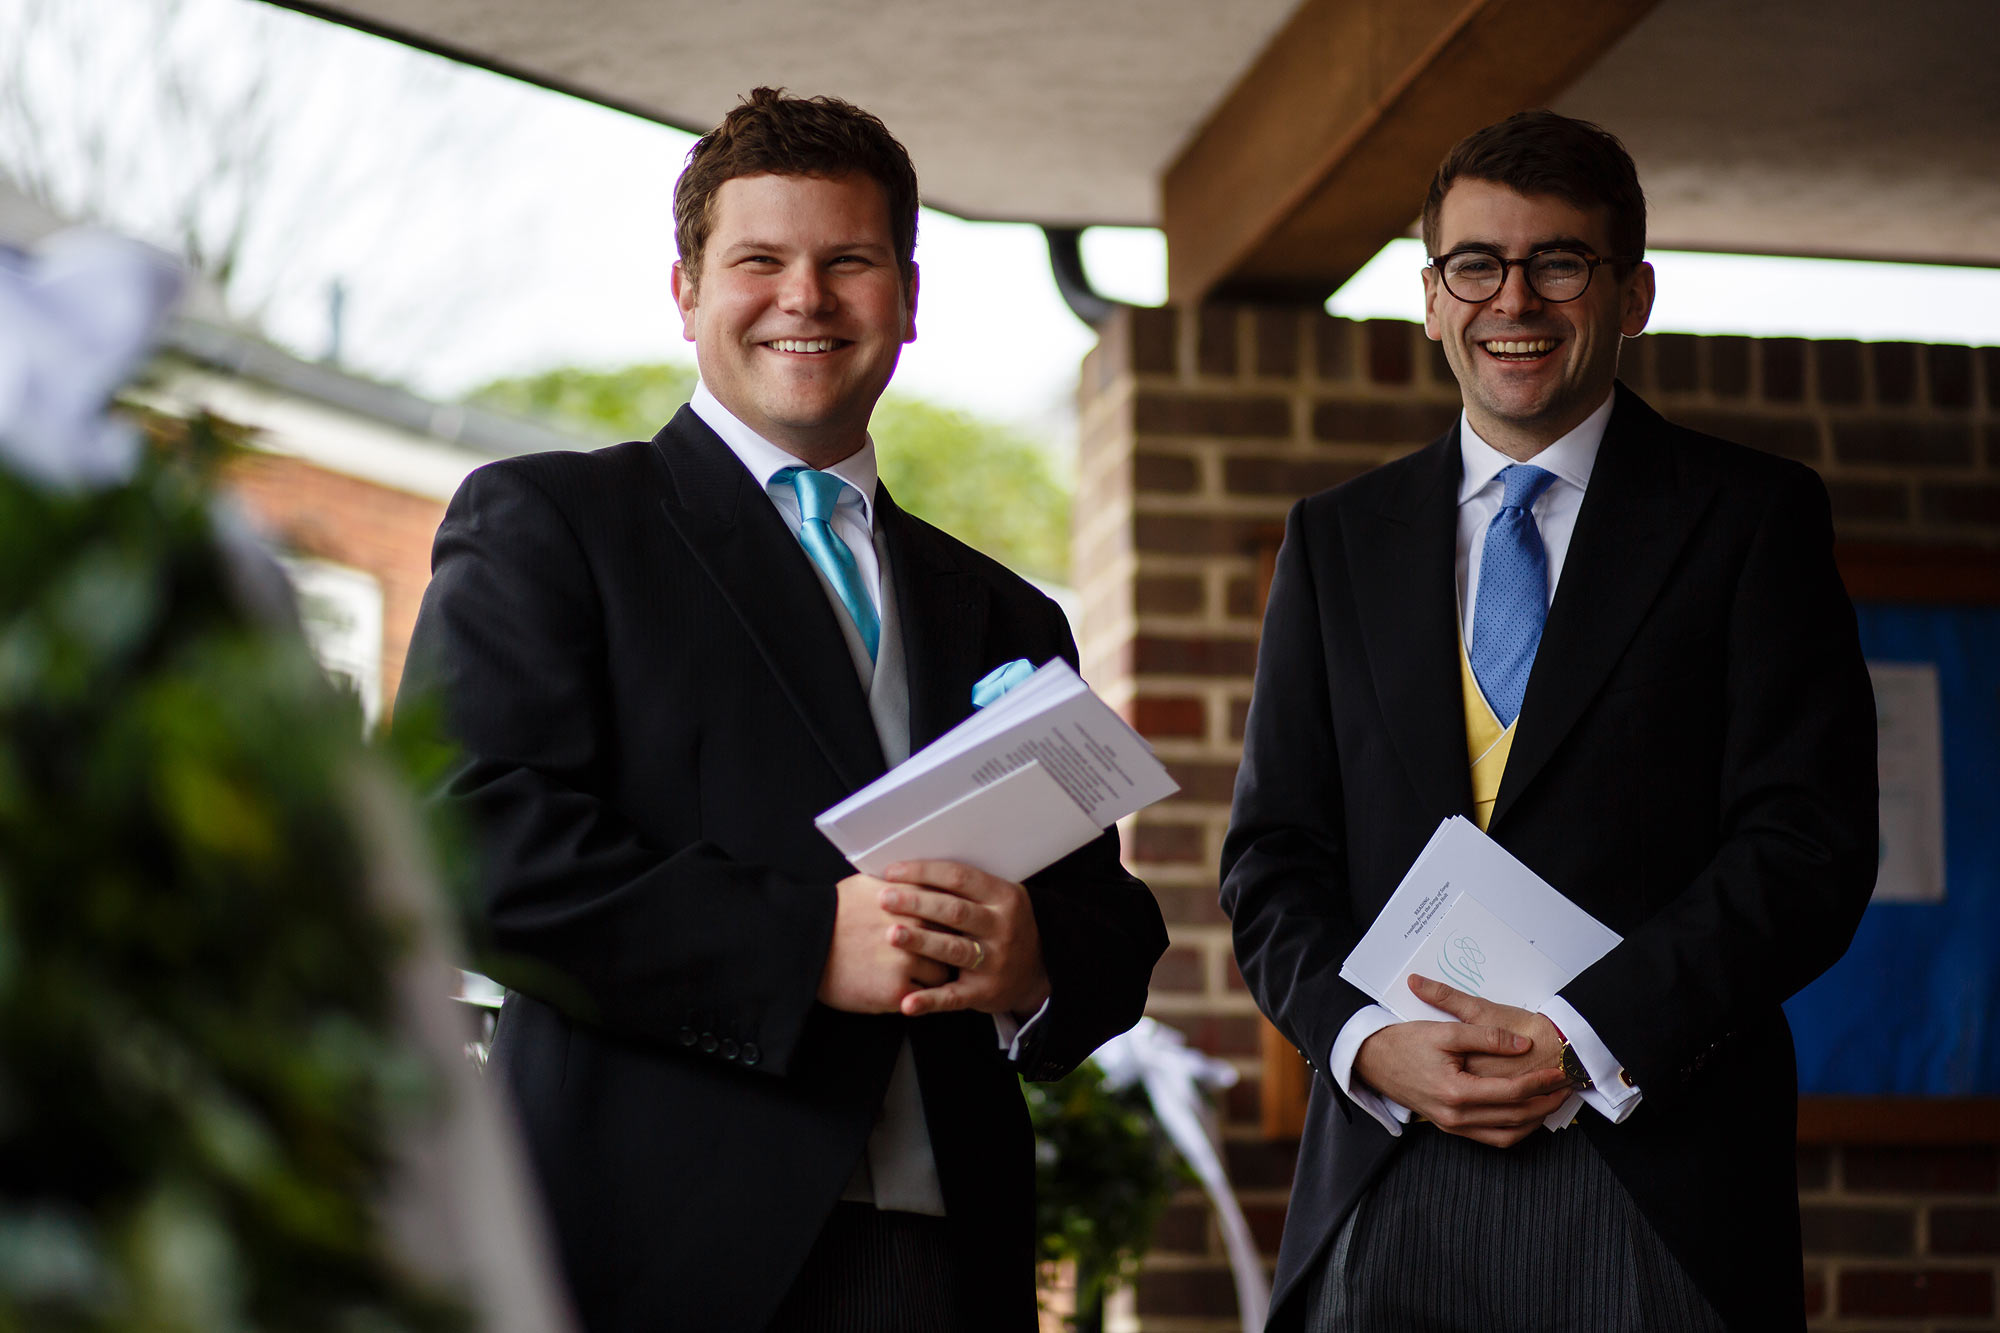 ushers in turquoise tie